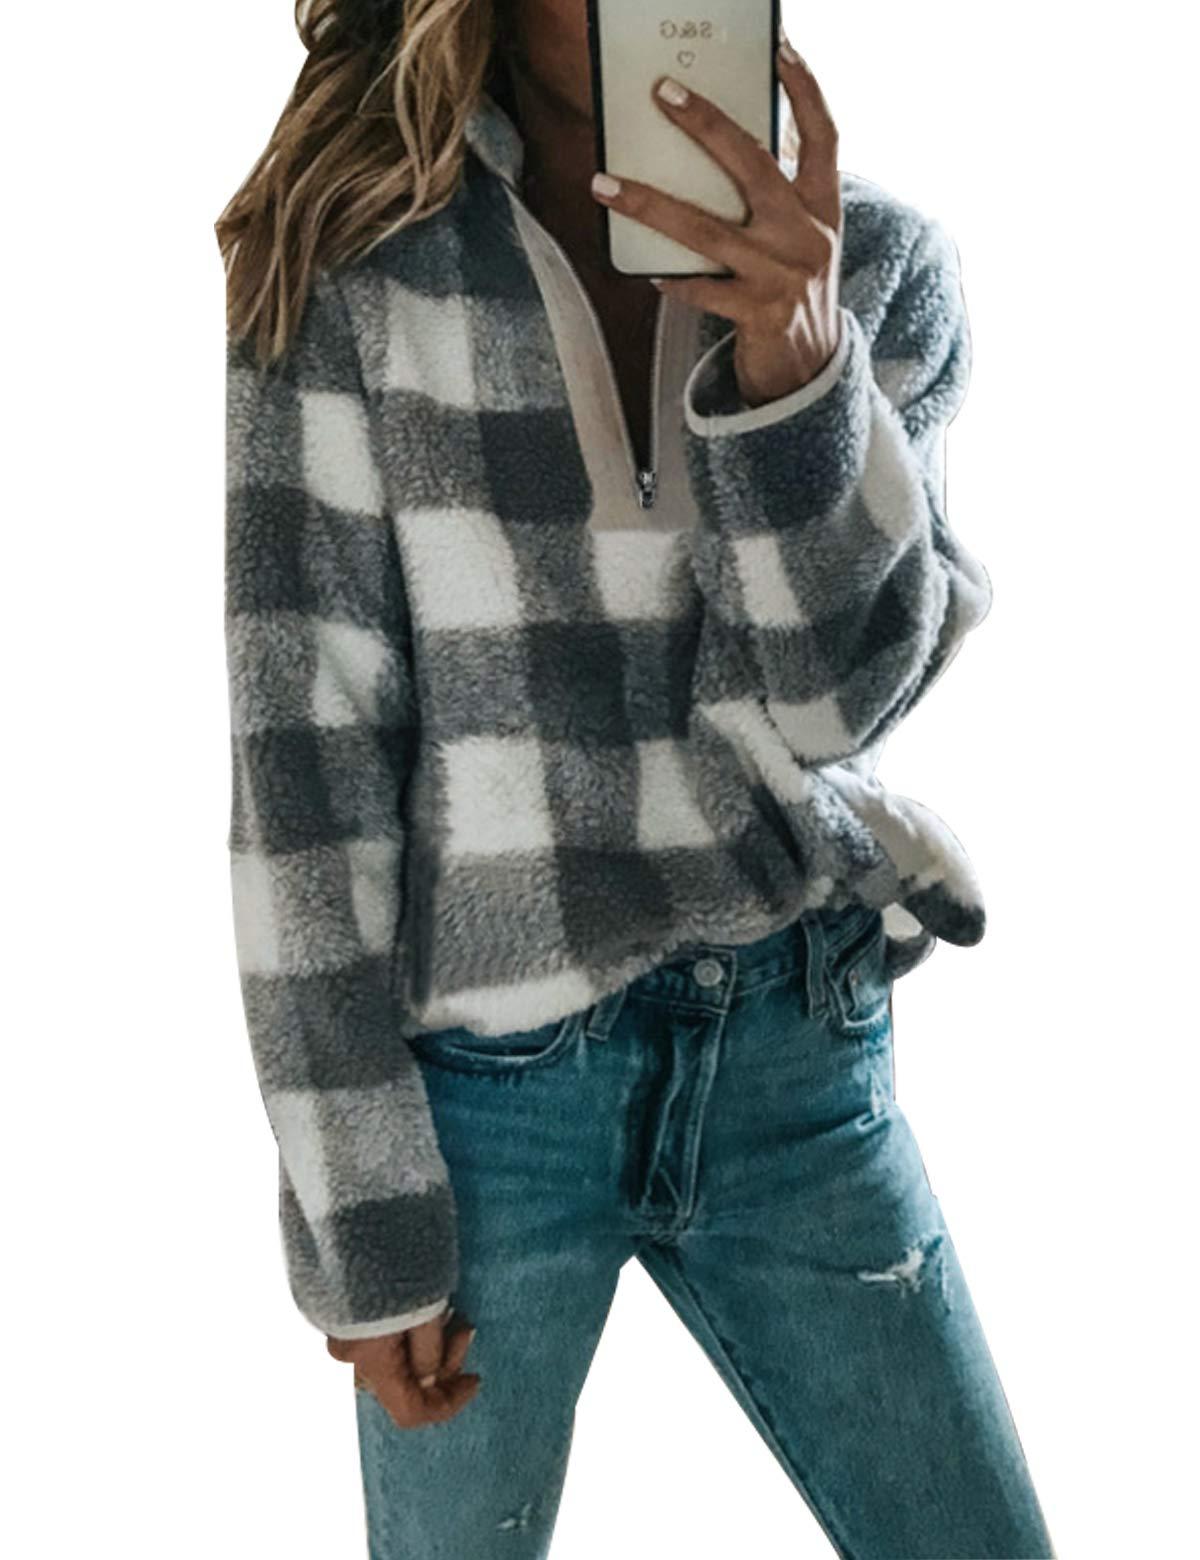 58dd72267624b9 CXINS Women Plaid Long Sleeve Zipper Sherpa Sweatshirt Soft Fleece Pullover  Outwear Coat Size S Grey and White